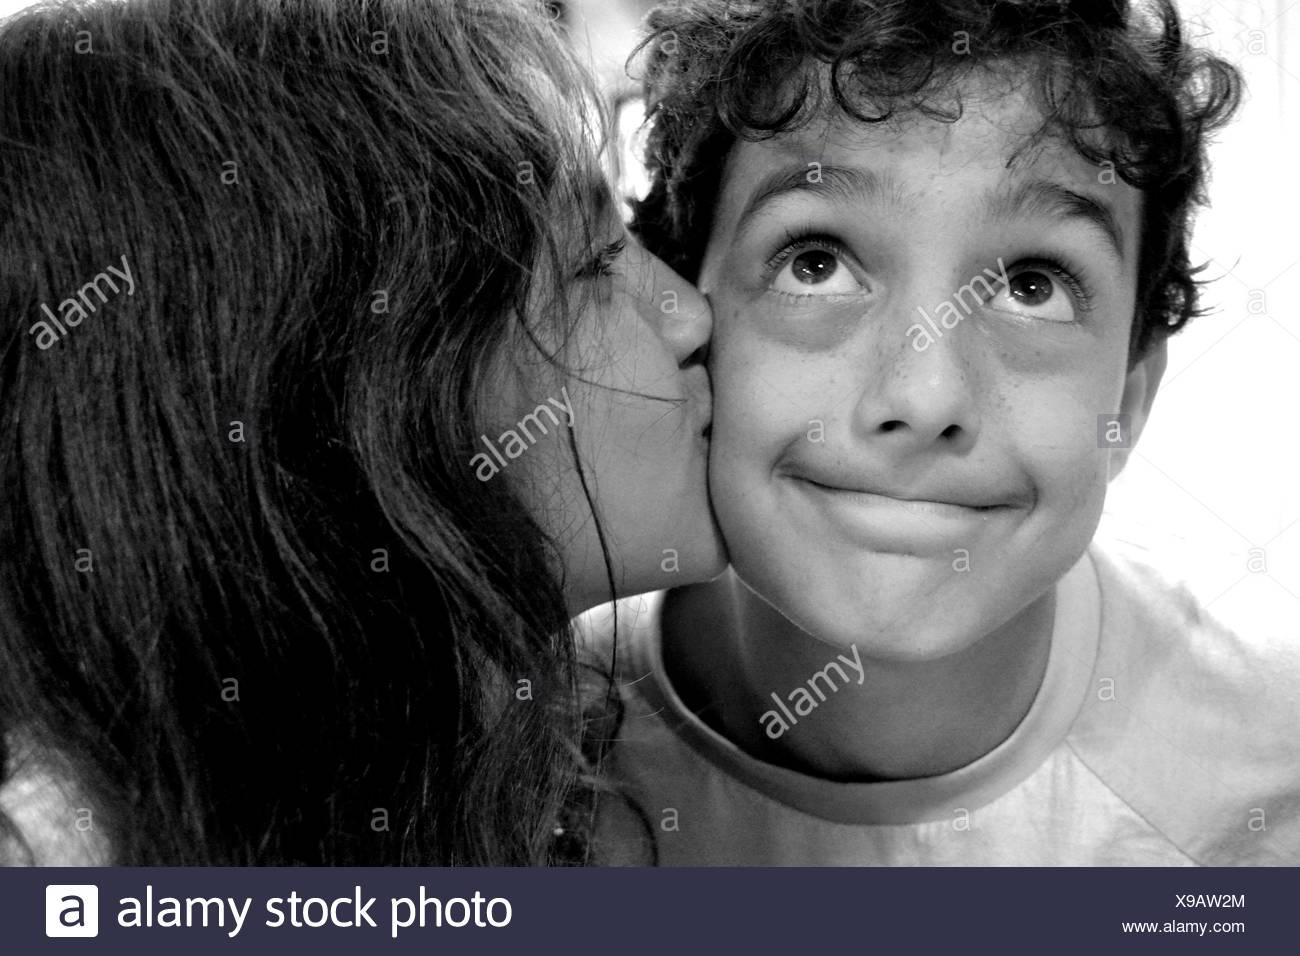 Girl kissing boy on the cheek - Stock Image